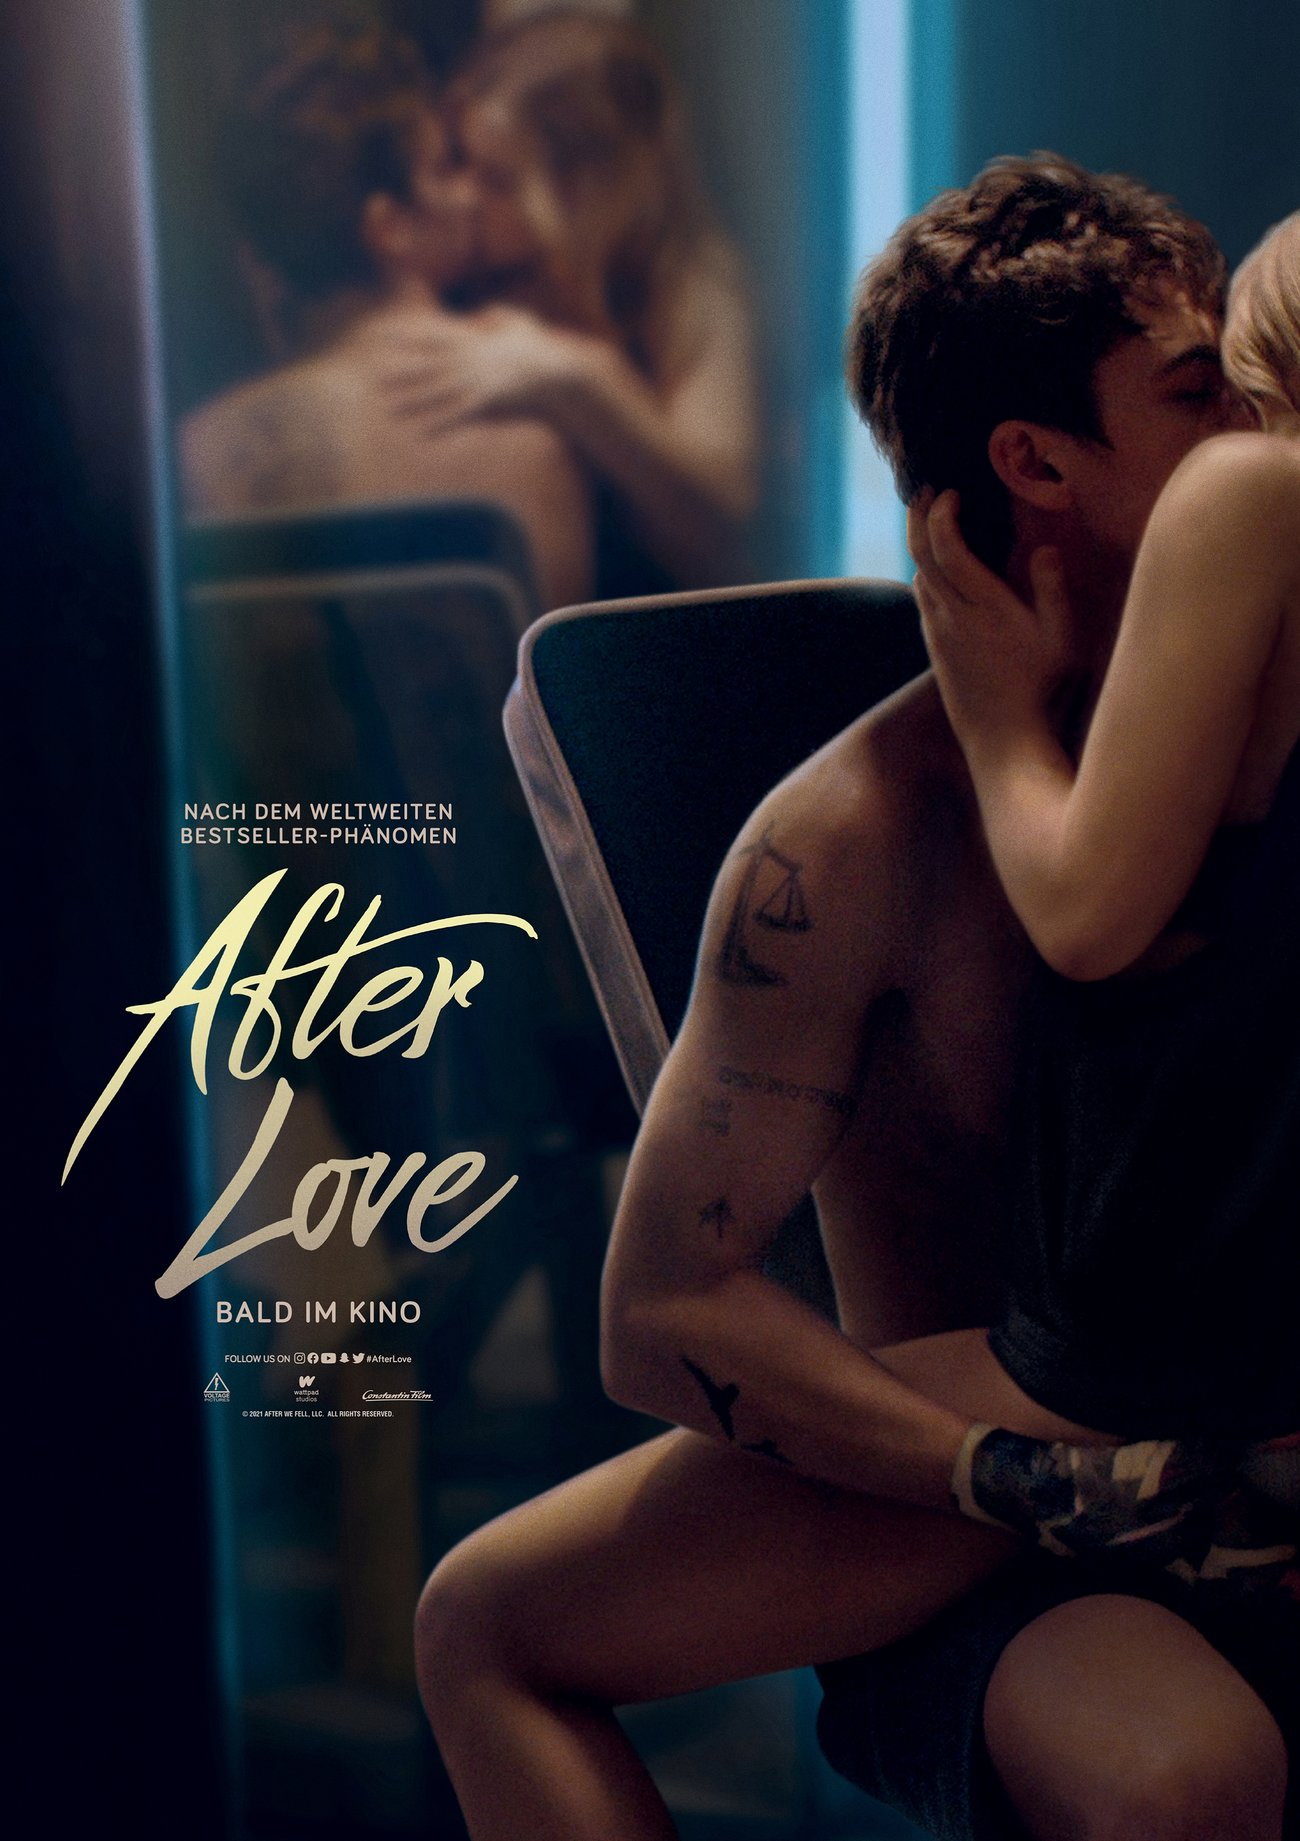 After Love Plakat